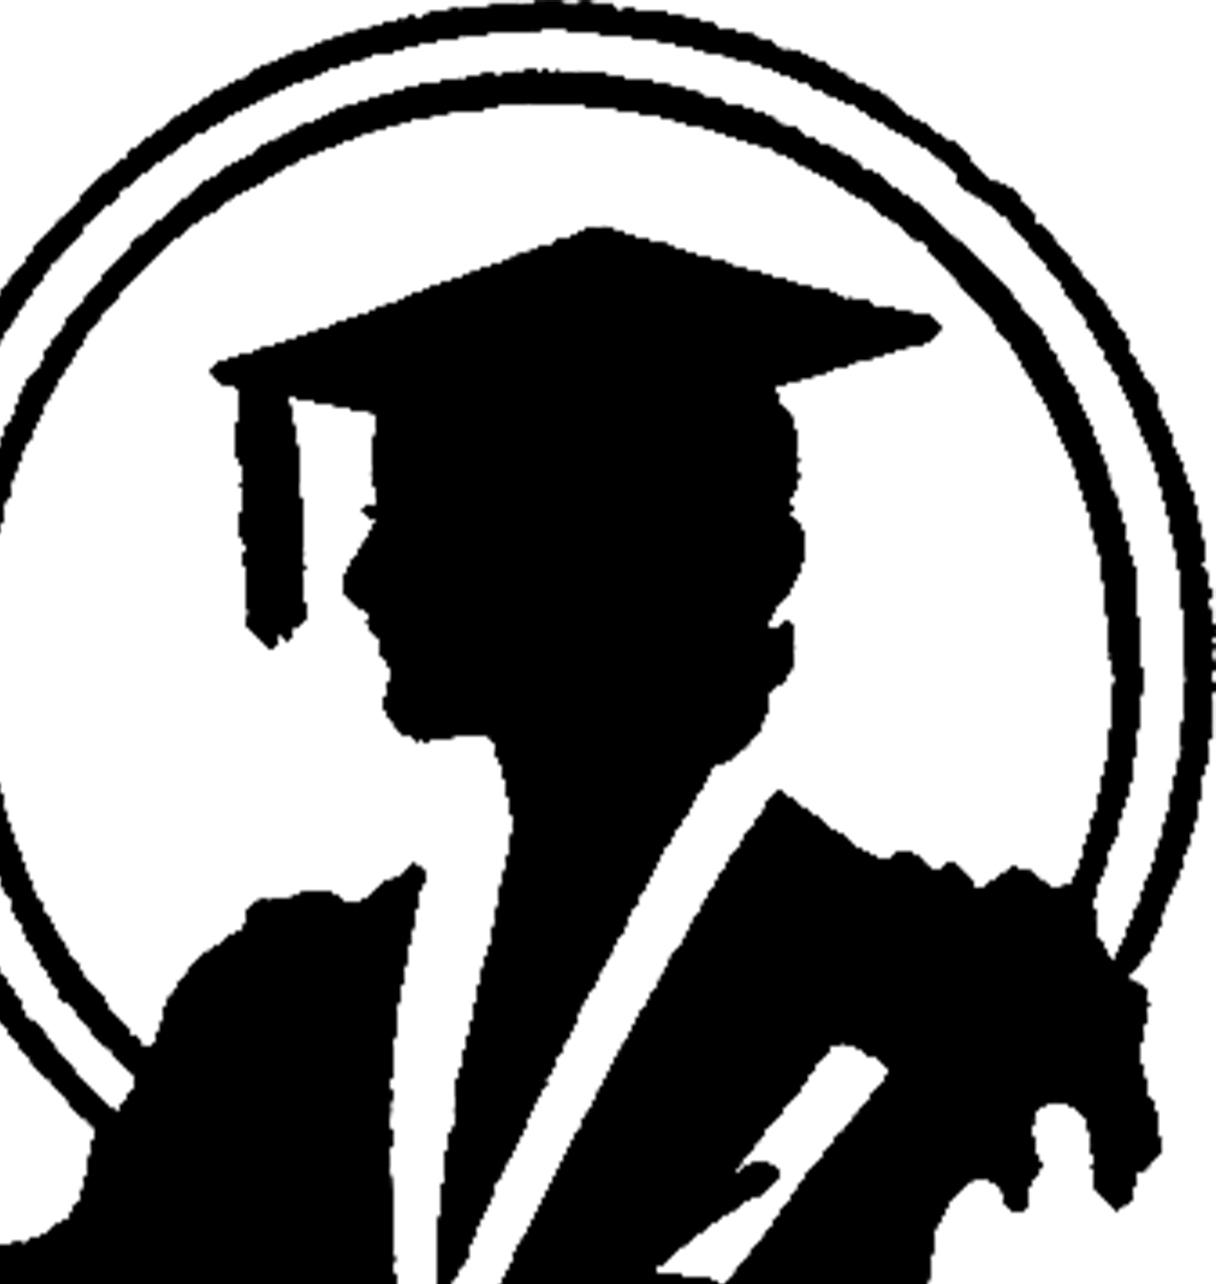 1216x1284 Graduation Silhouette Image